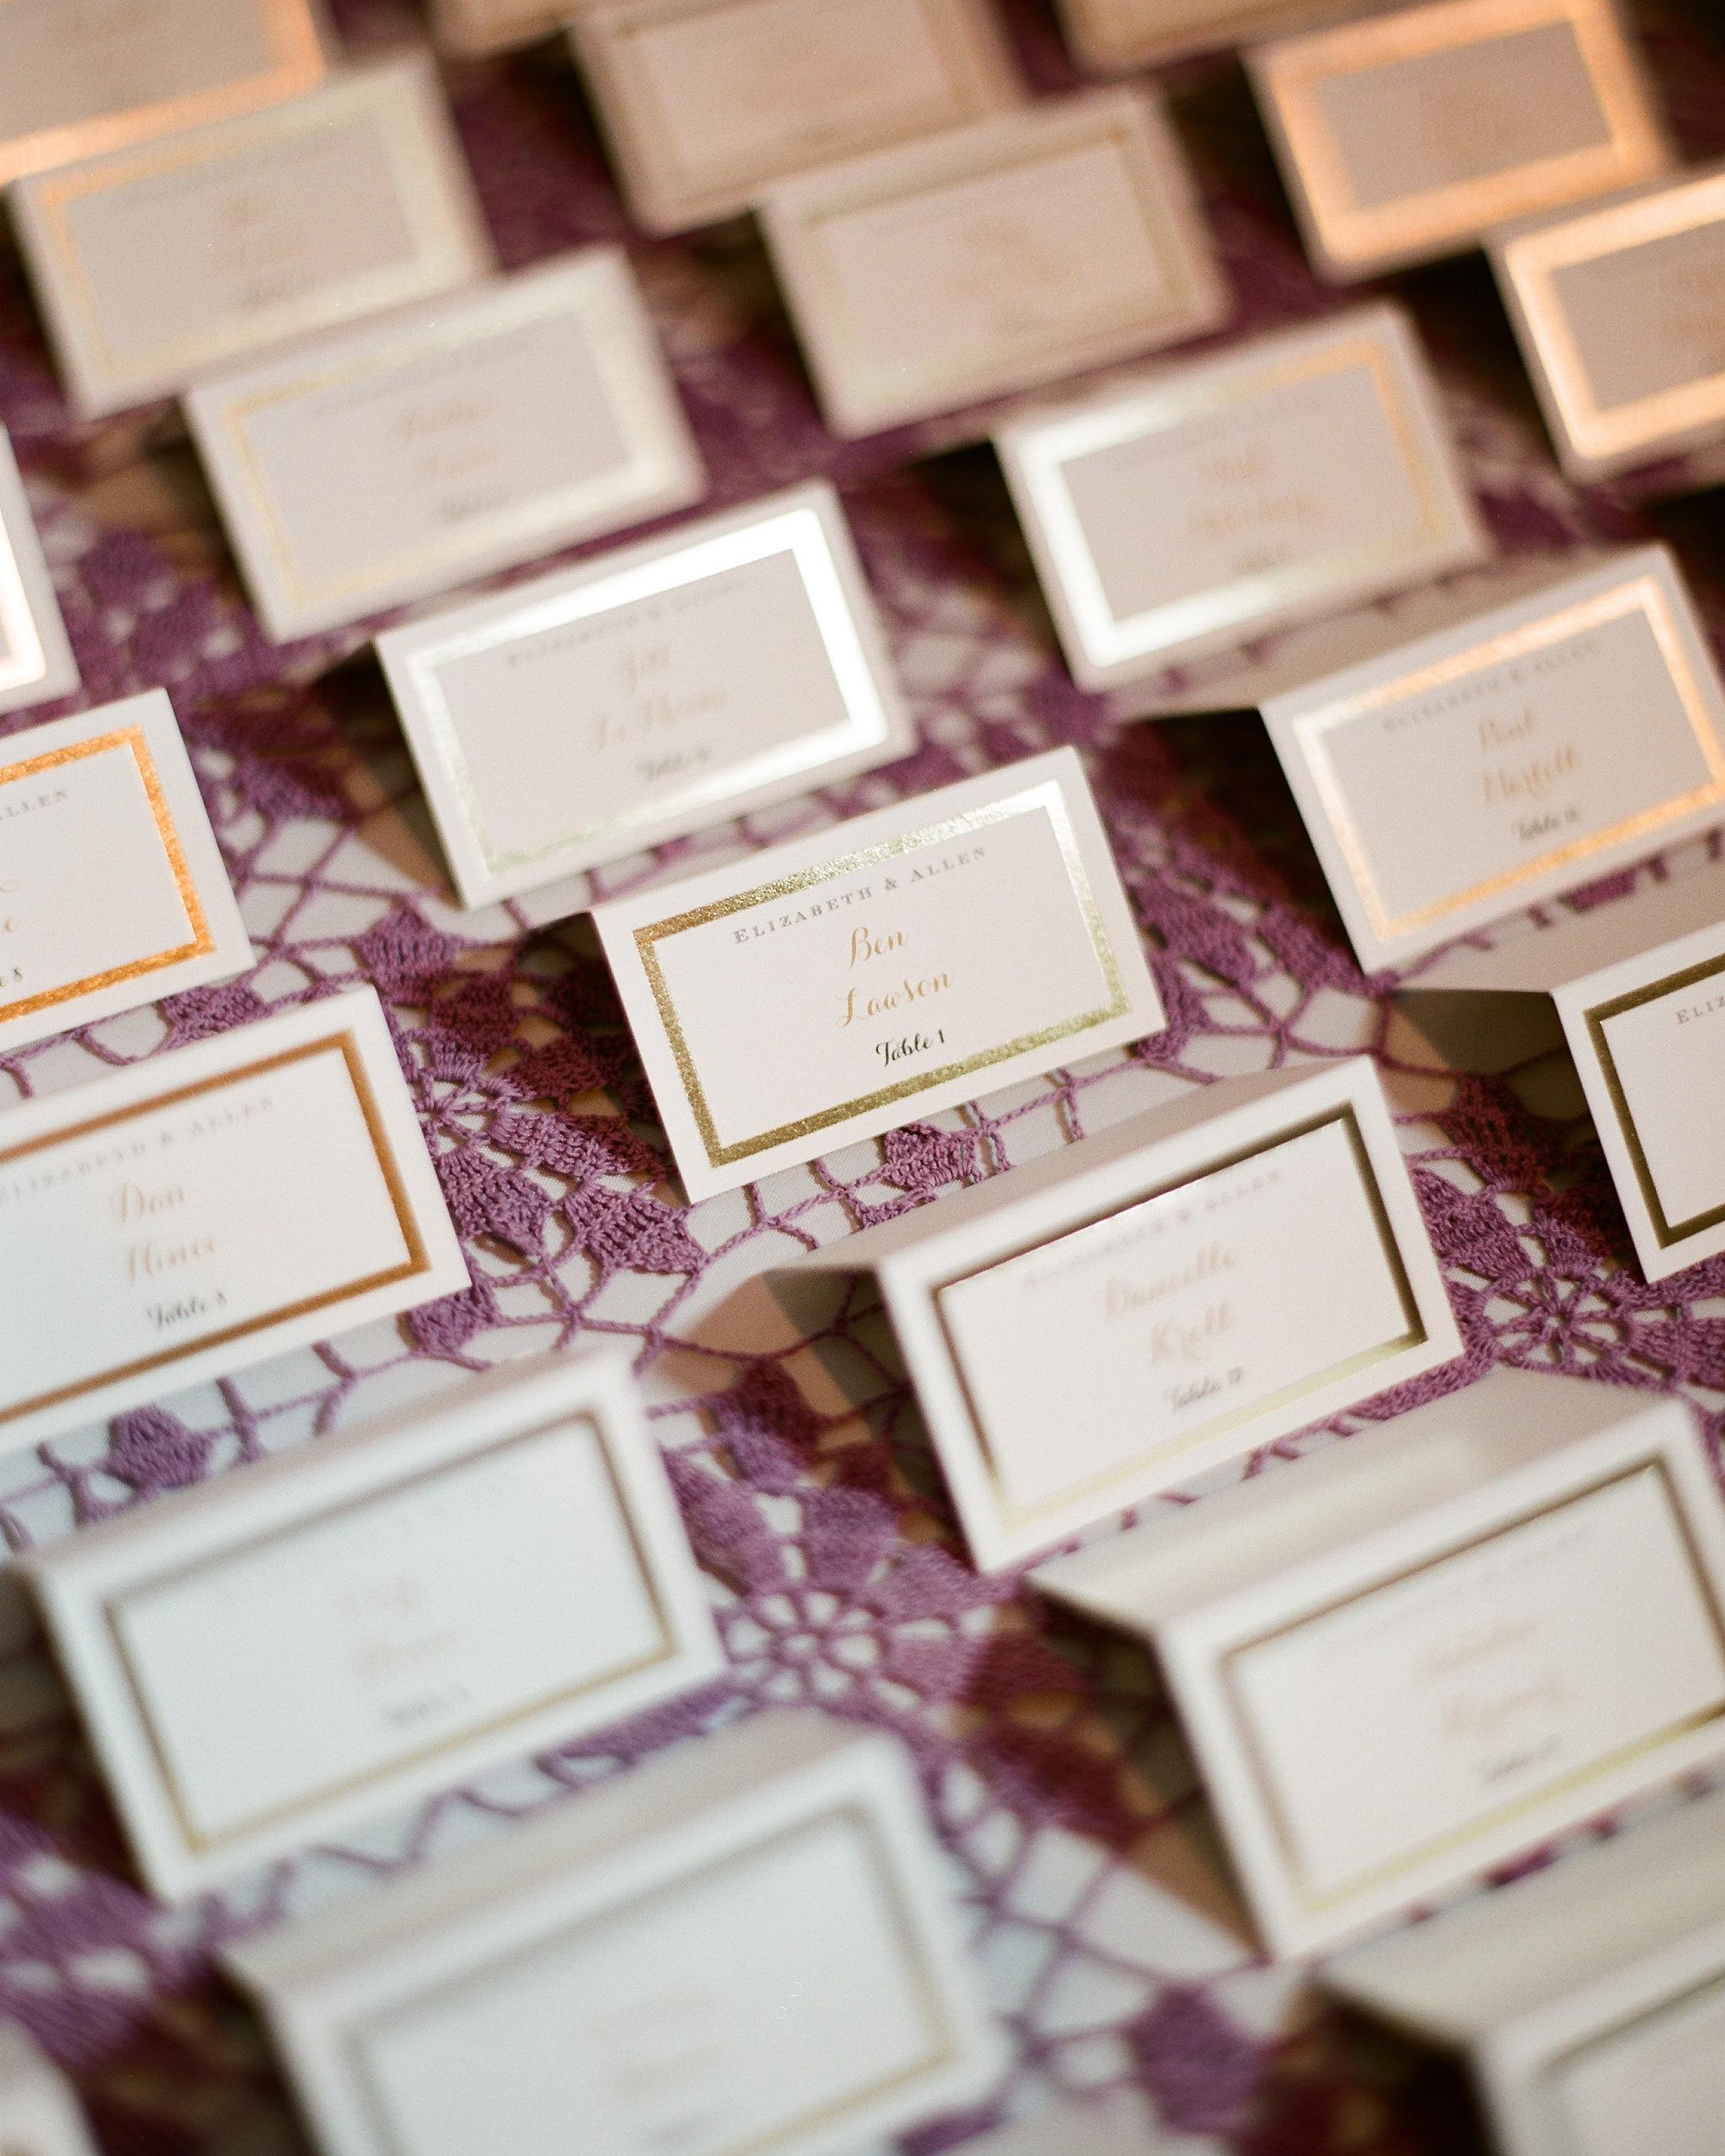 libby-allen-wedding-escortcard-083-s112487-0116.jpg